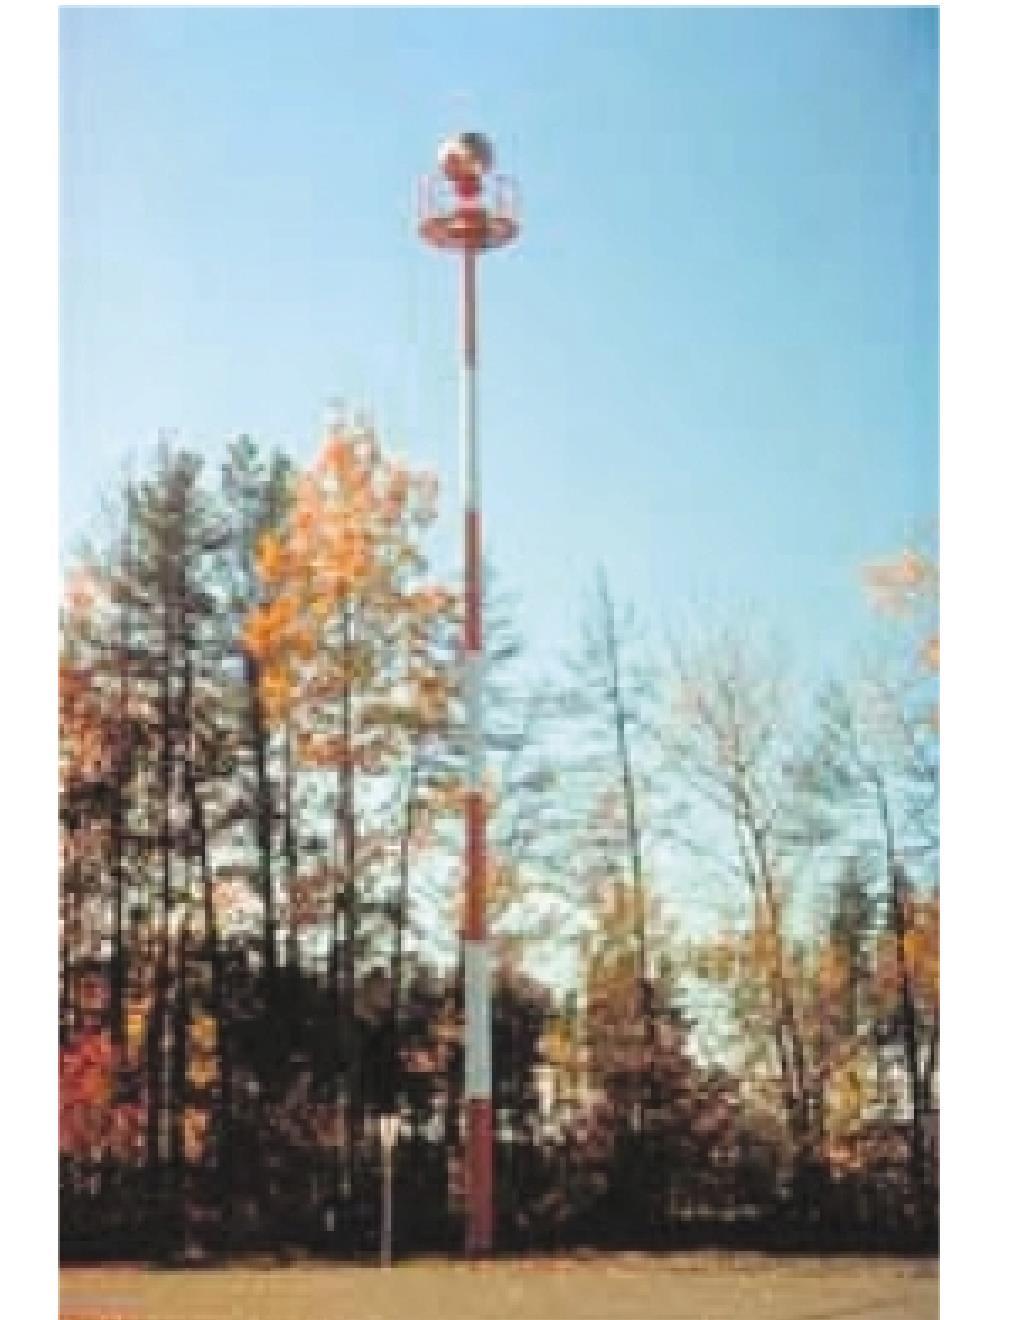 Flashing rotating beacon